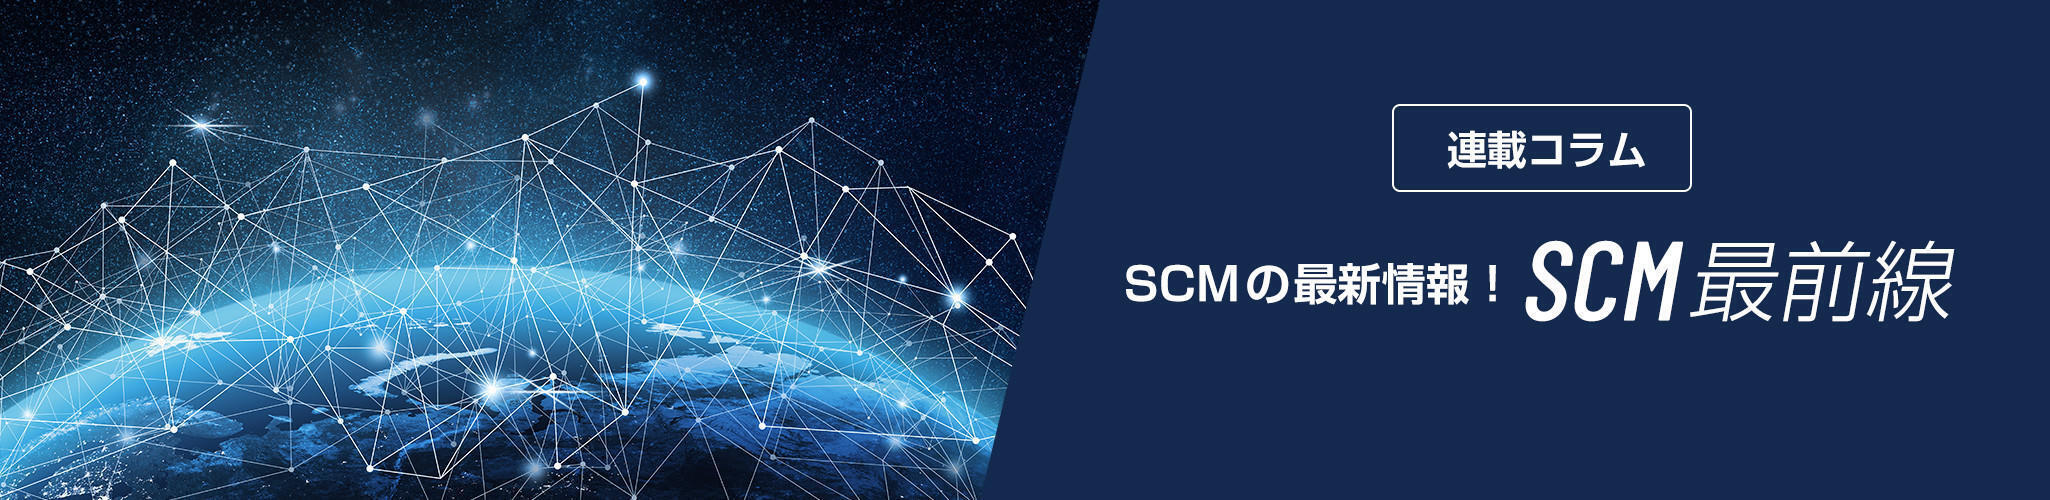 SCM最前線